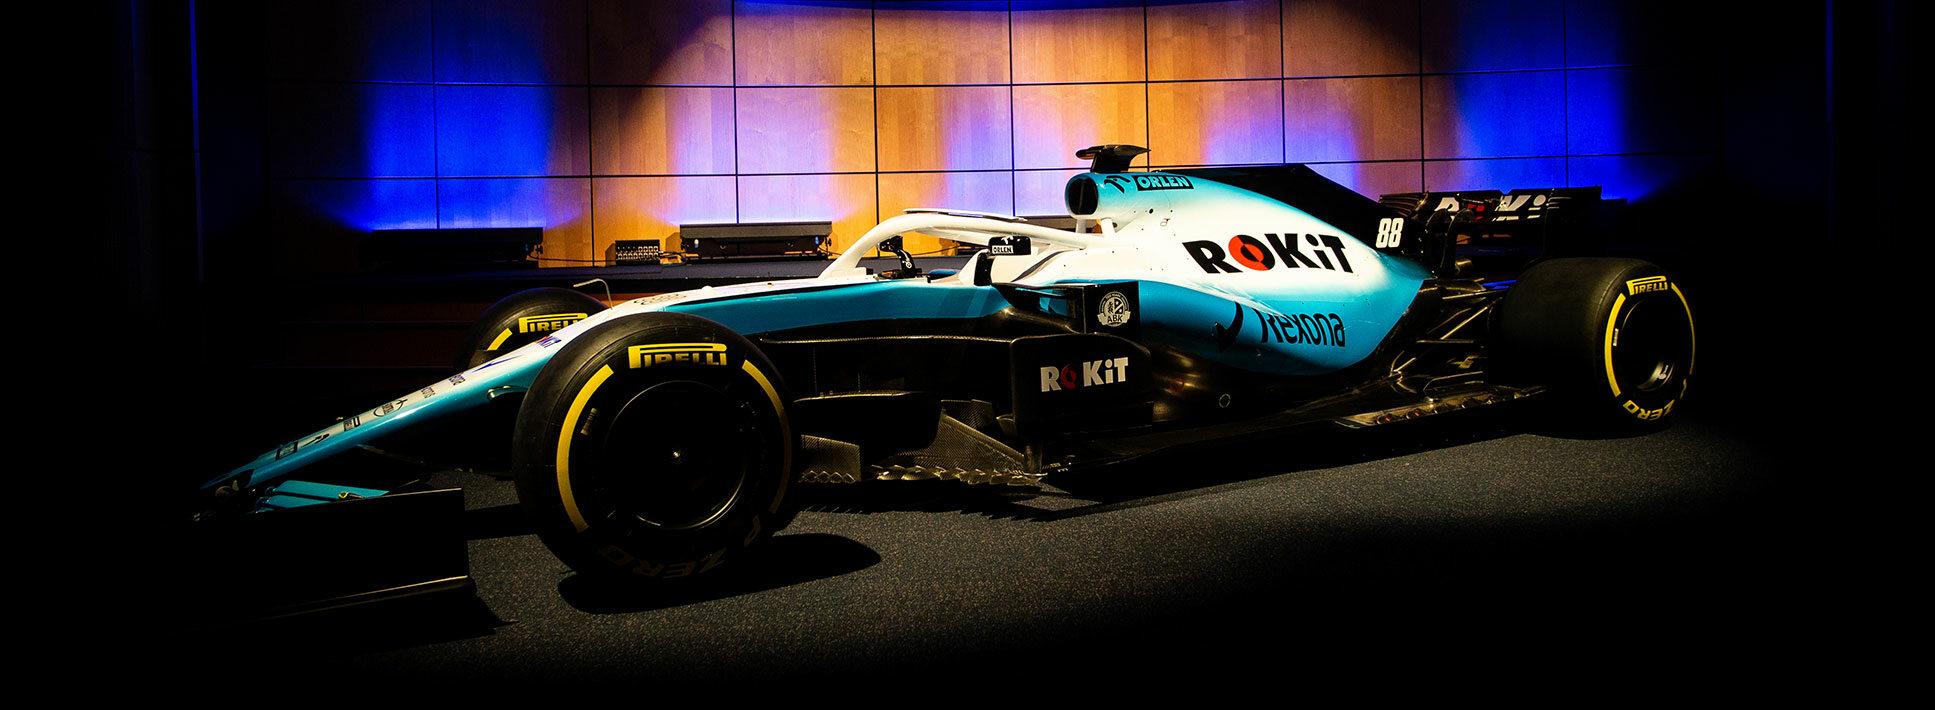 Nowy bolid Rokit Williams Racing